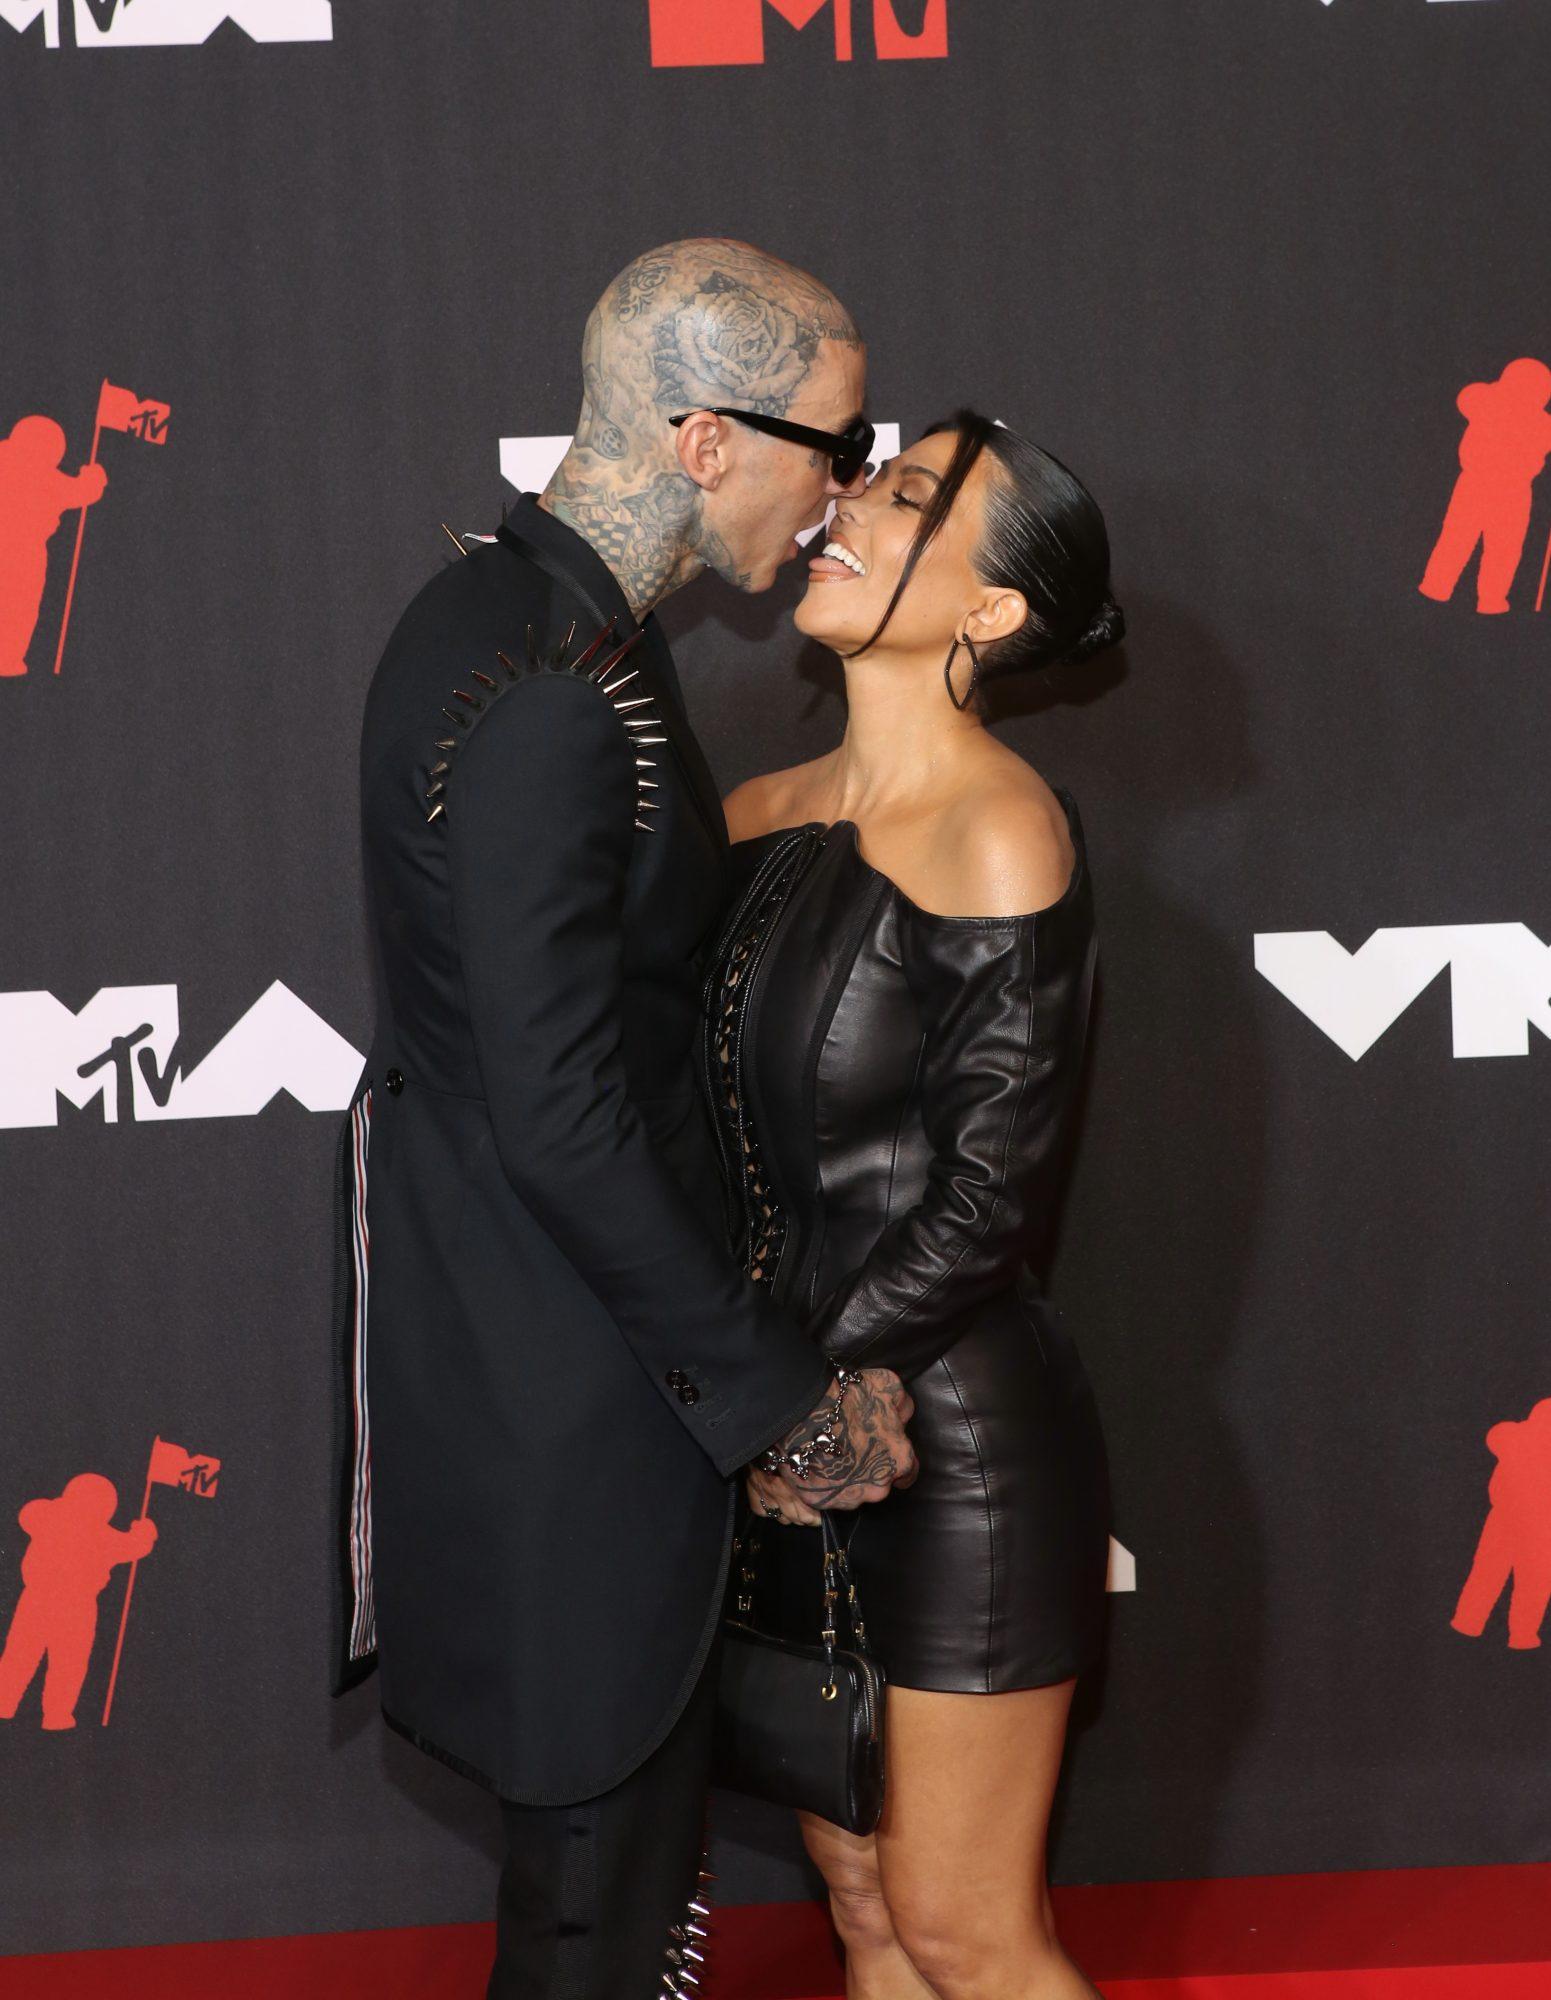 Travis Barker Kourtney Kardashian VMAs 2021